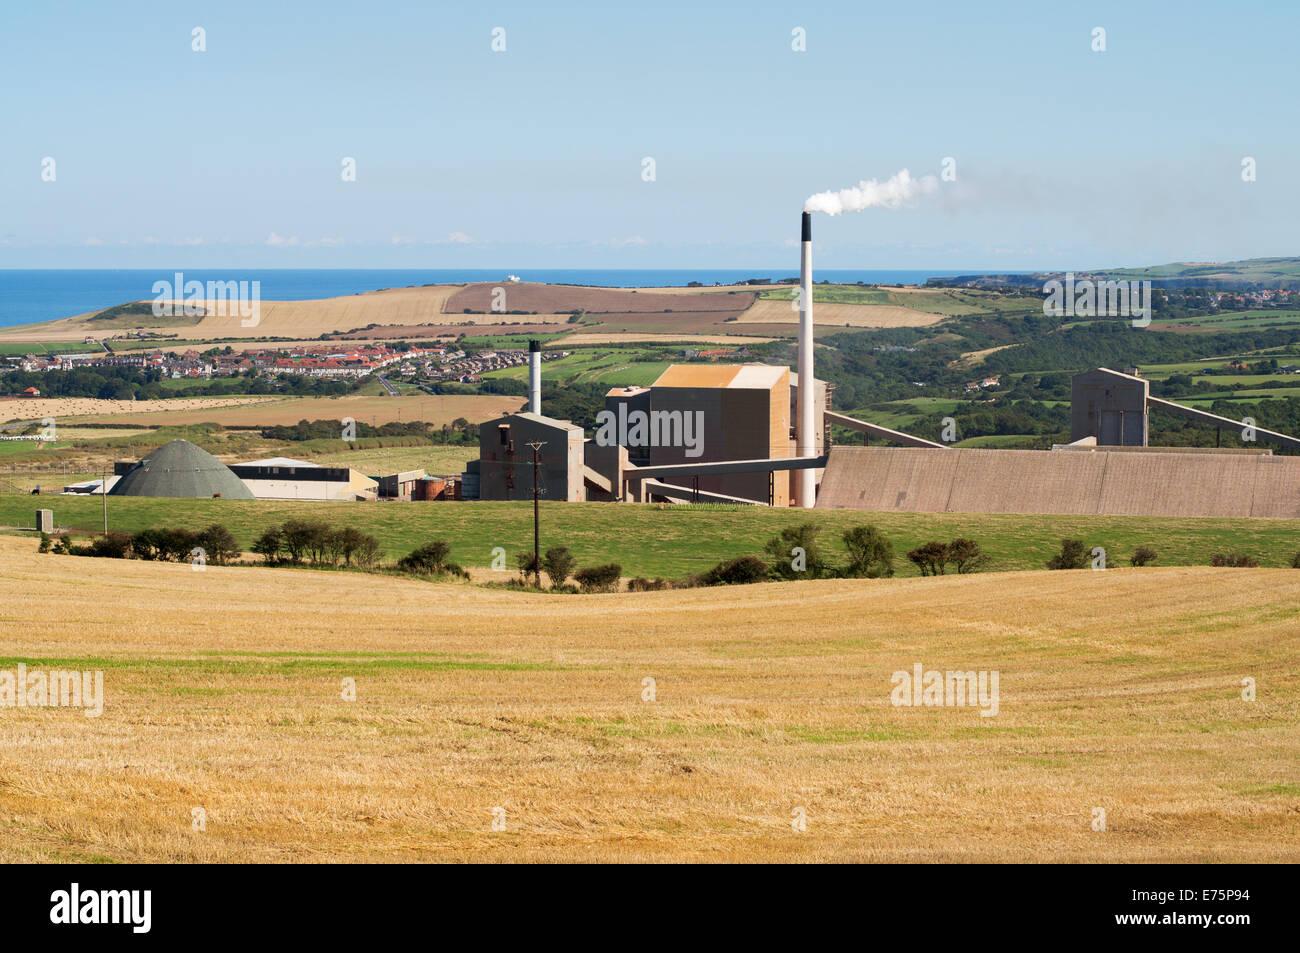 ICL Fertilizers Boulby Potash Mine, Loftus, North Yorkshire, England, UK - Stock Image